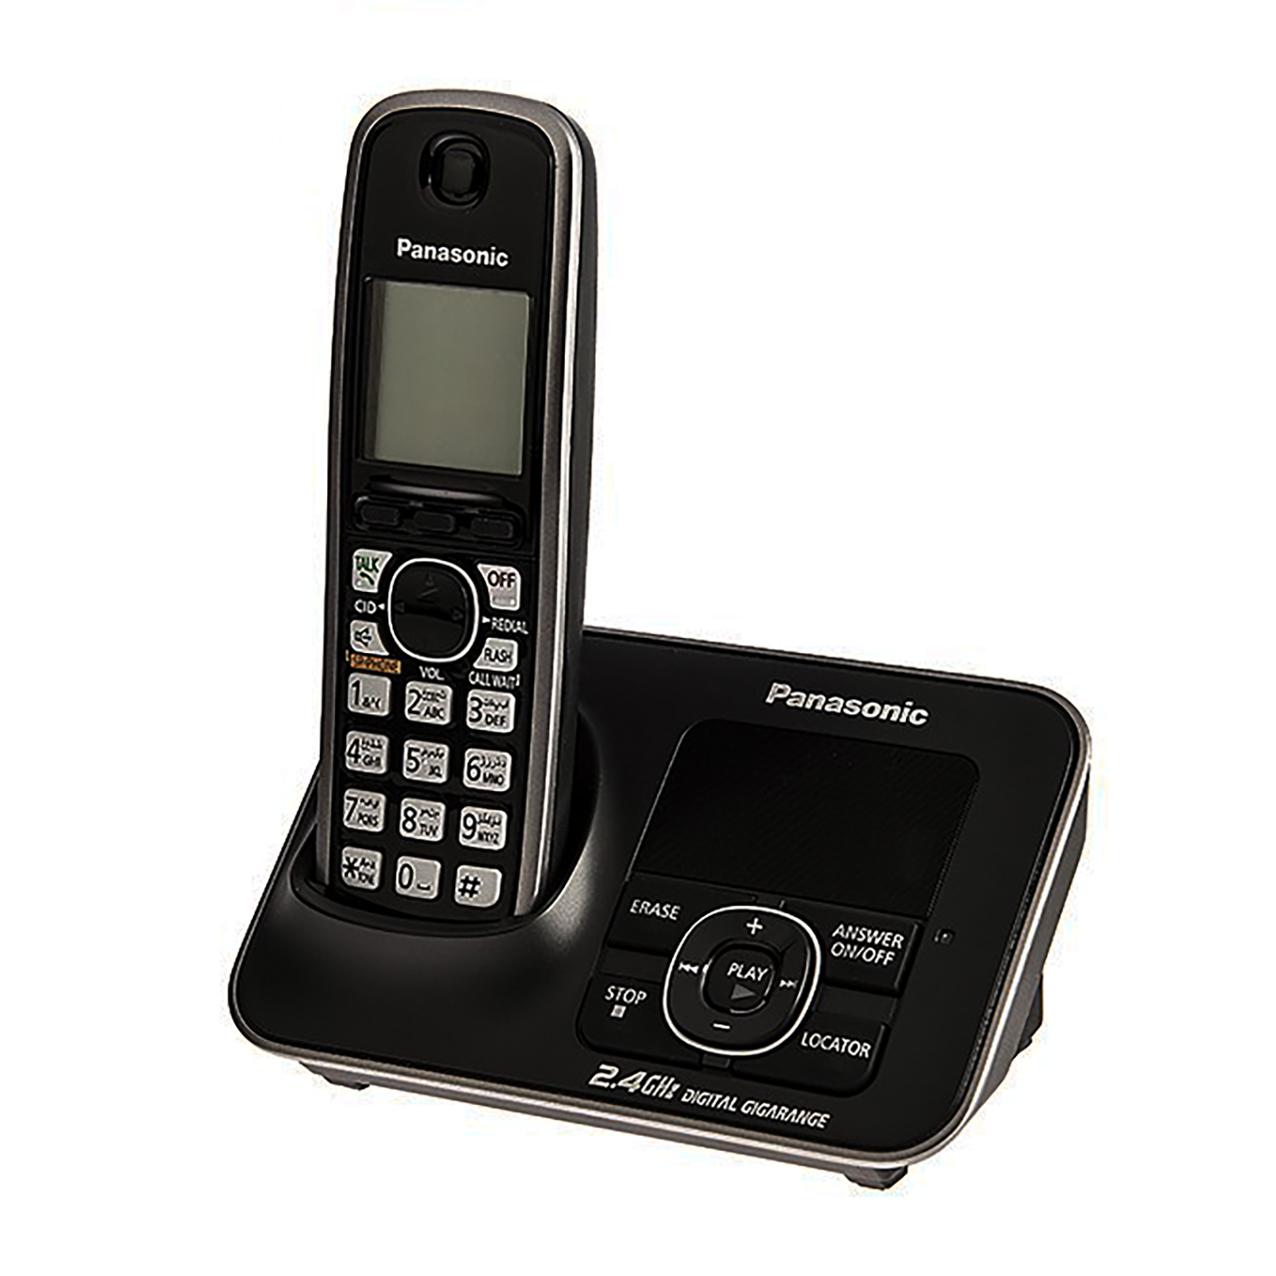 گوشی تلفن بیسیم پاناسونیک مدل KX-TG3721